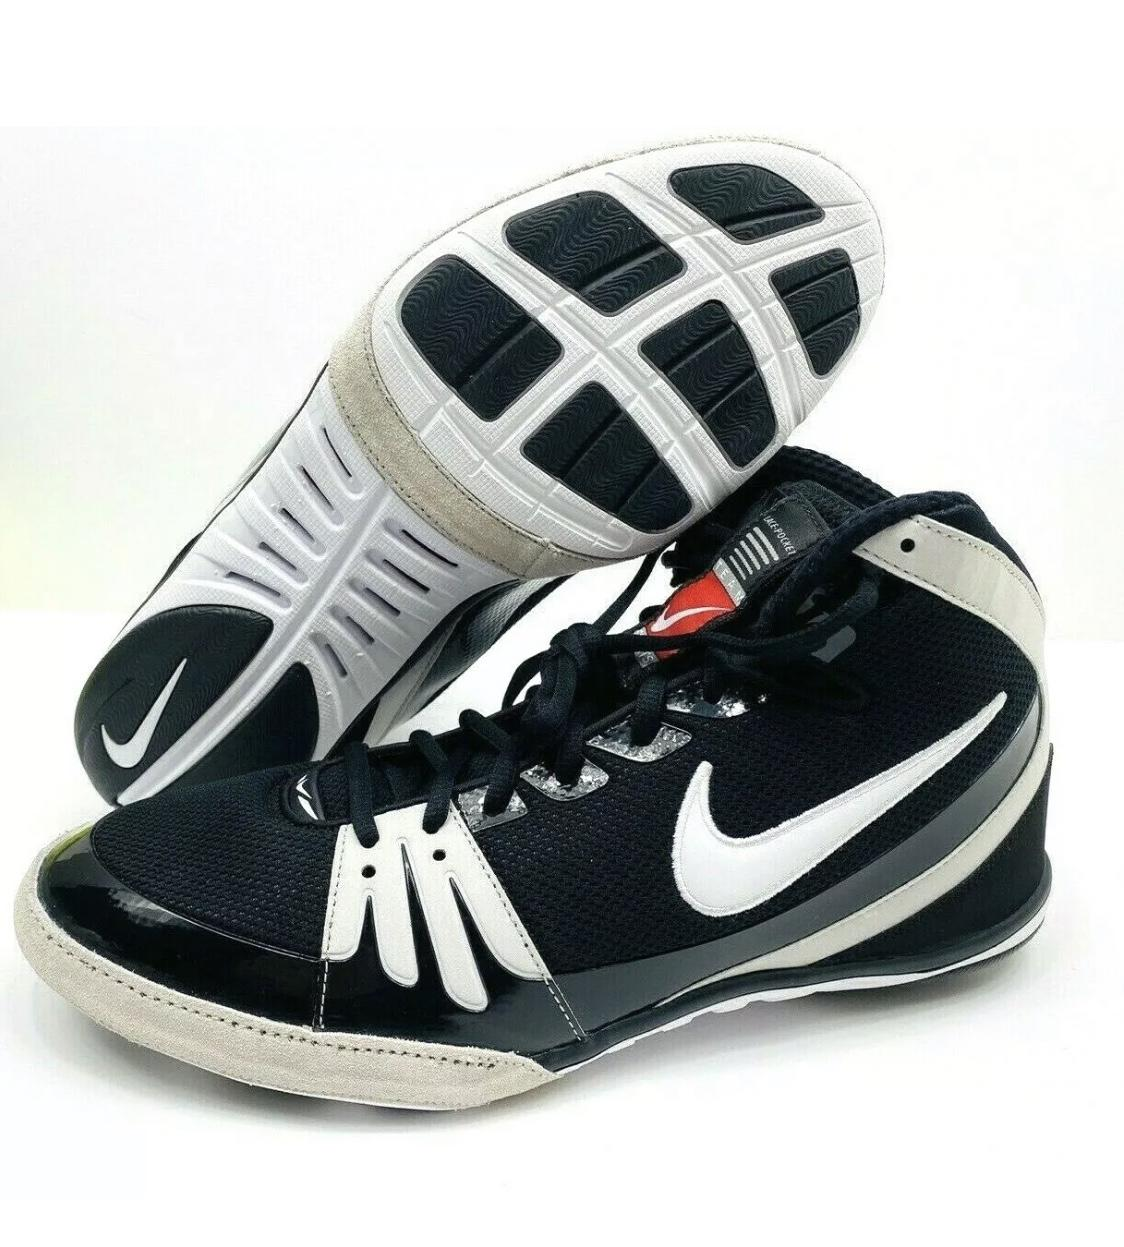 Nike Freek Wrestling Shoes Size 14